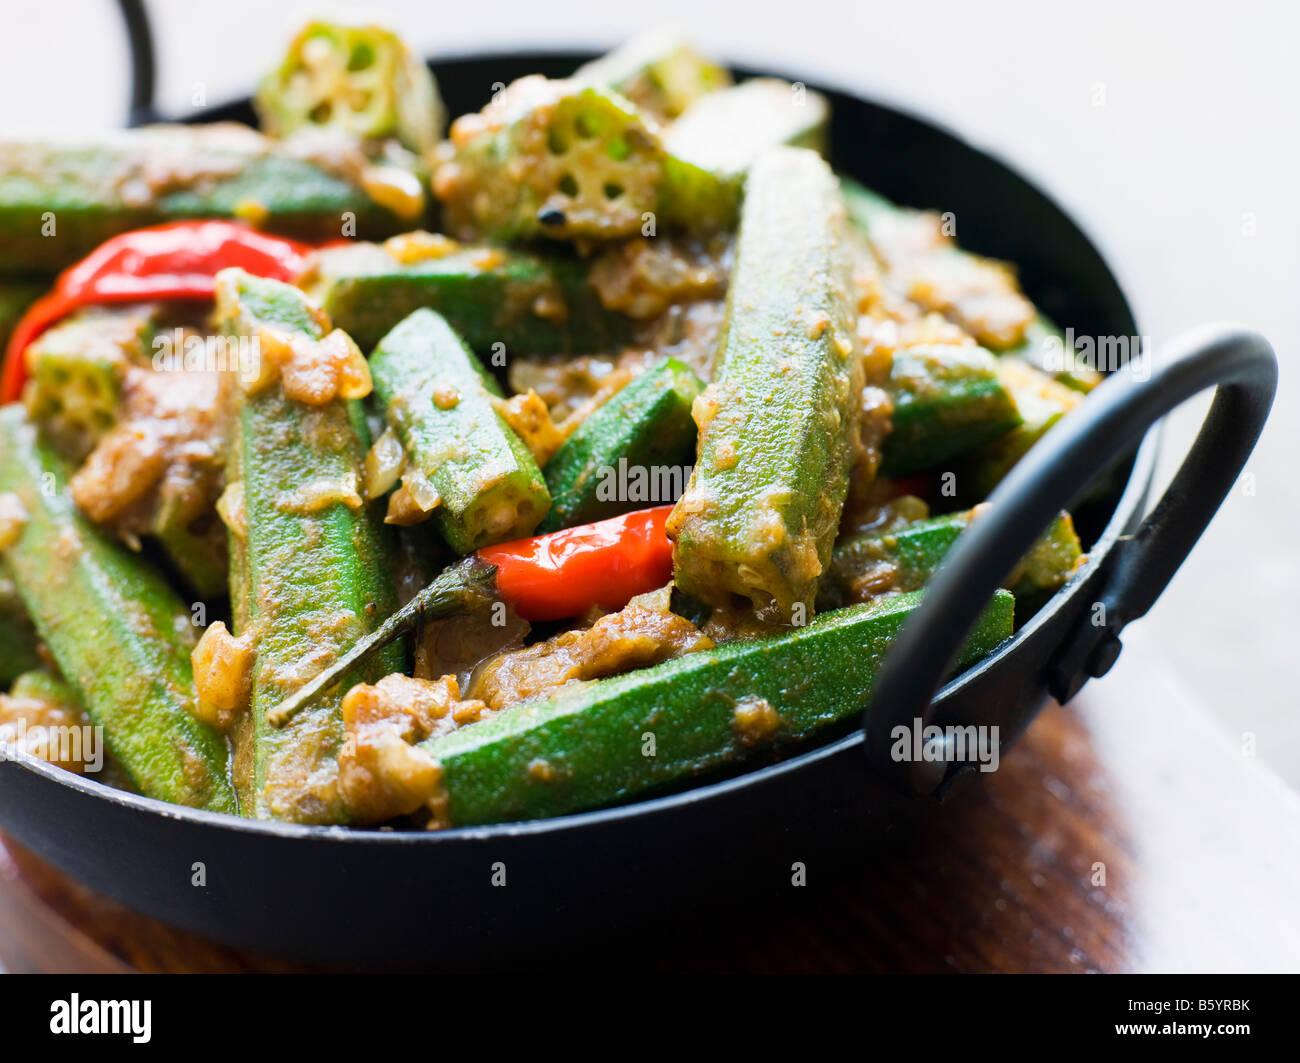 Karahi Dish with Bhindi Masala - Stock Image